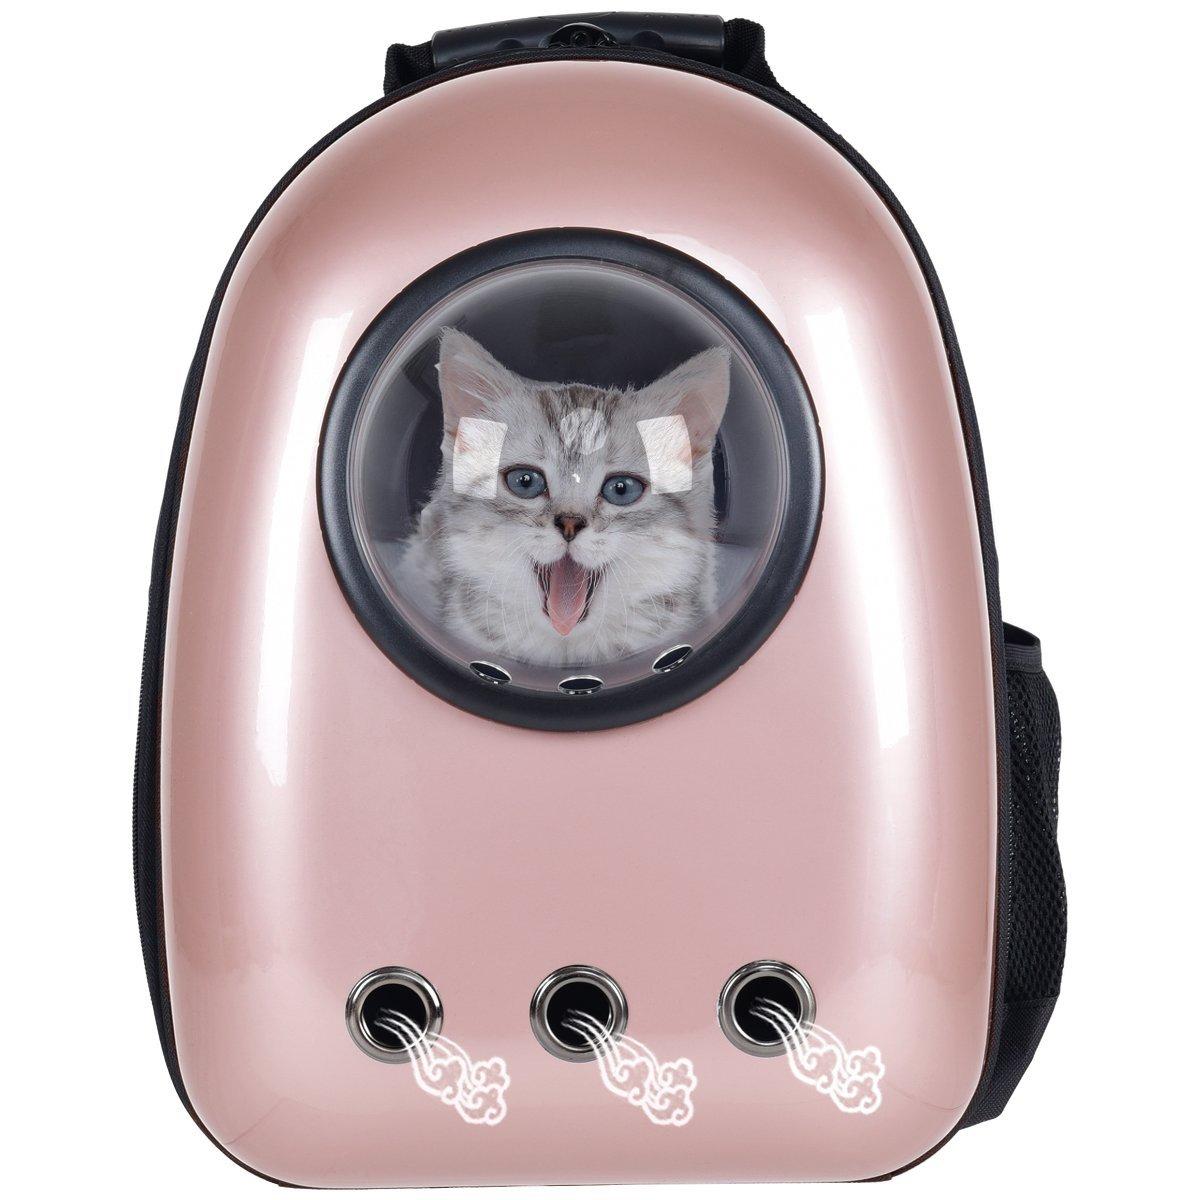 Giantex-Astronaut-Pet-Cat-Dog-Puppy-Carrier-Golden-Rose-Color